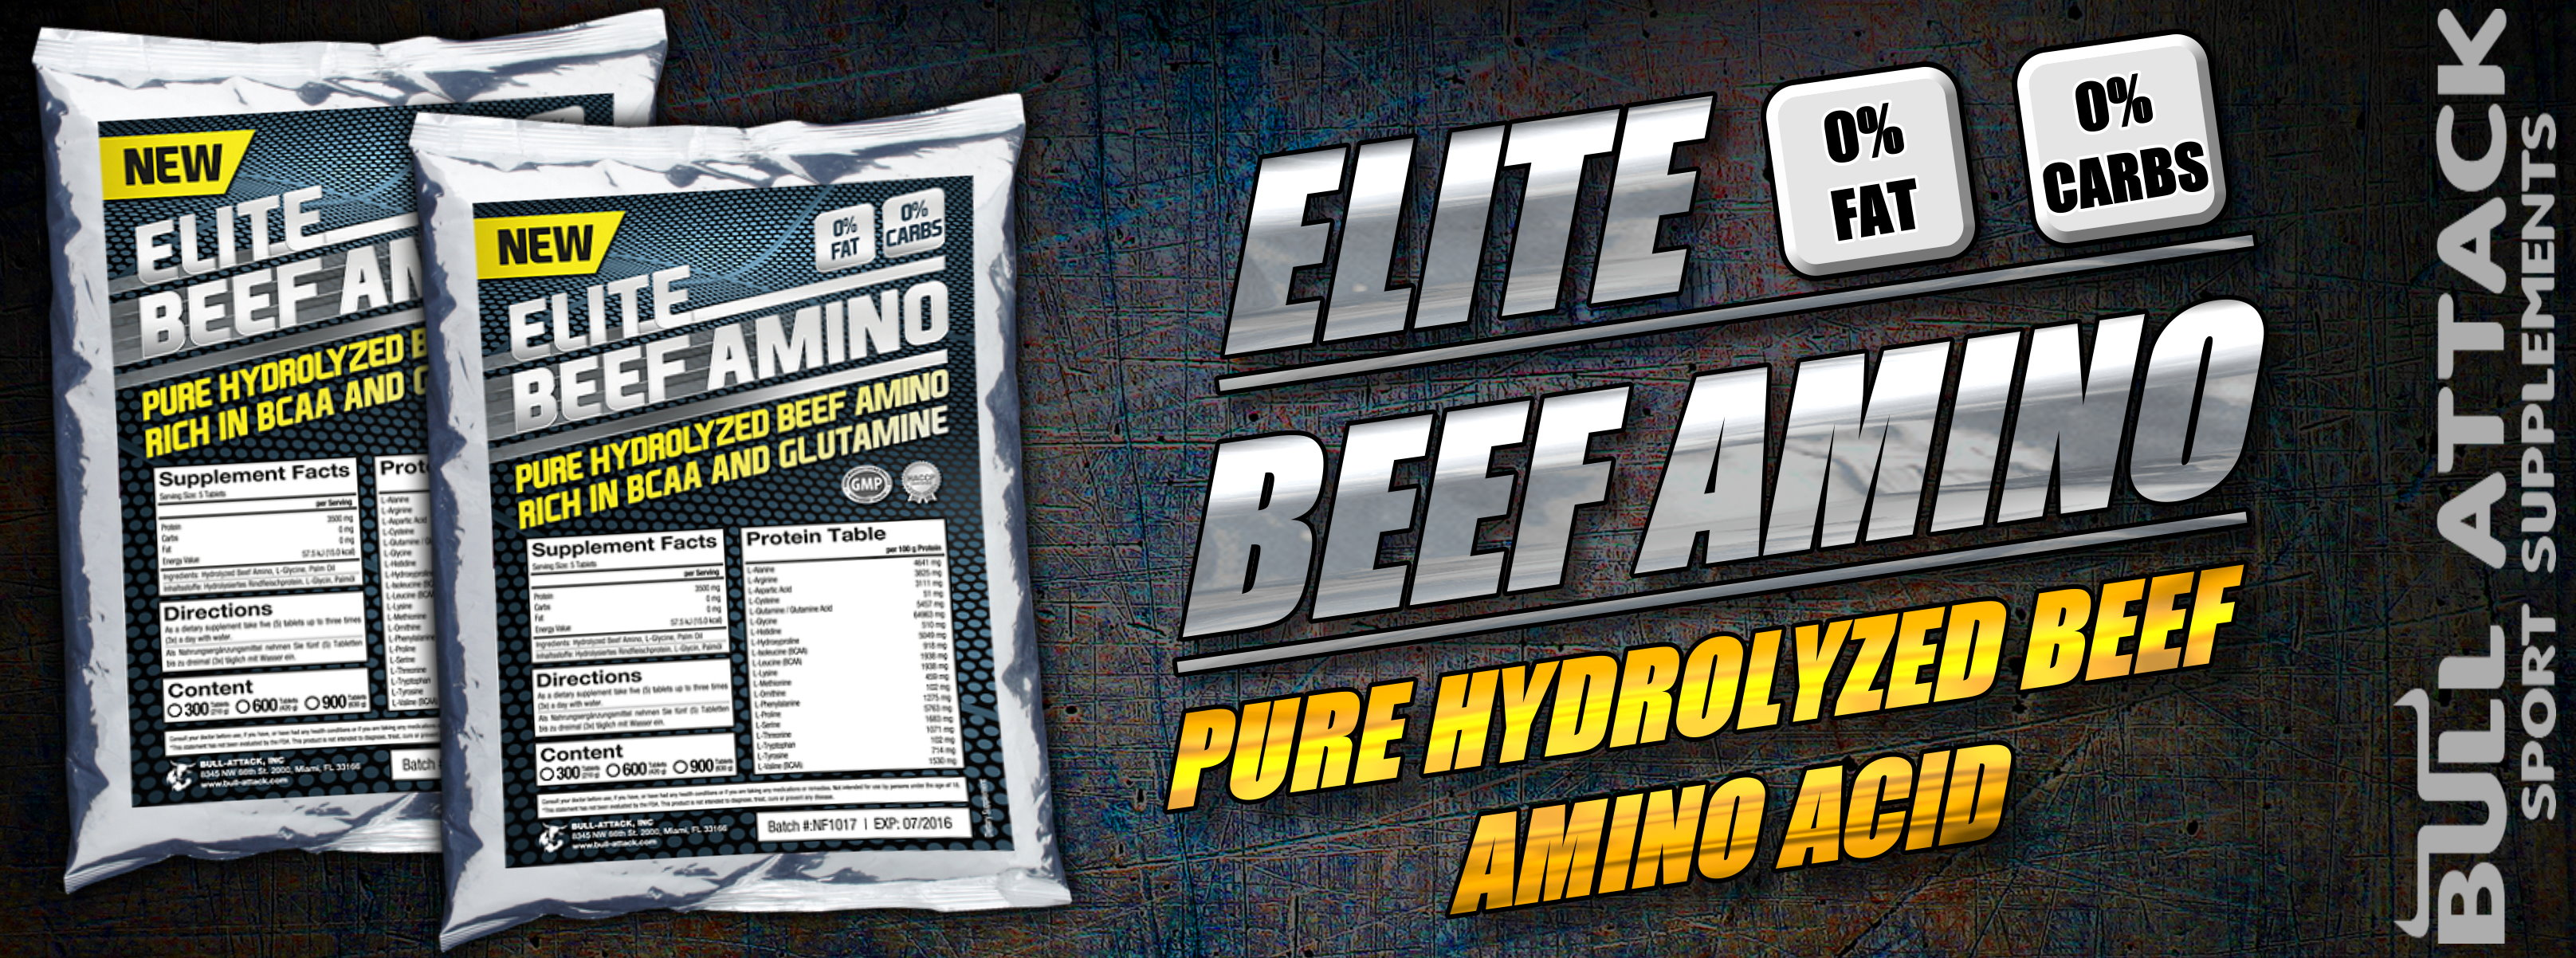 http://bull-attack.com/images/ELITE-BEEF-AMINO-BANNER.jpg